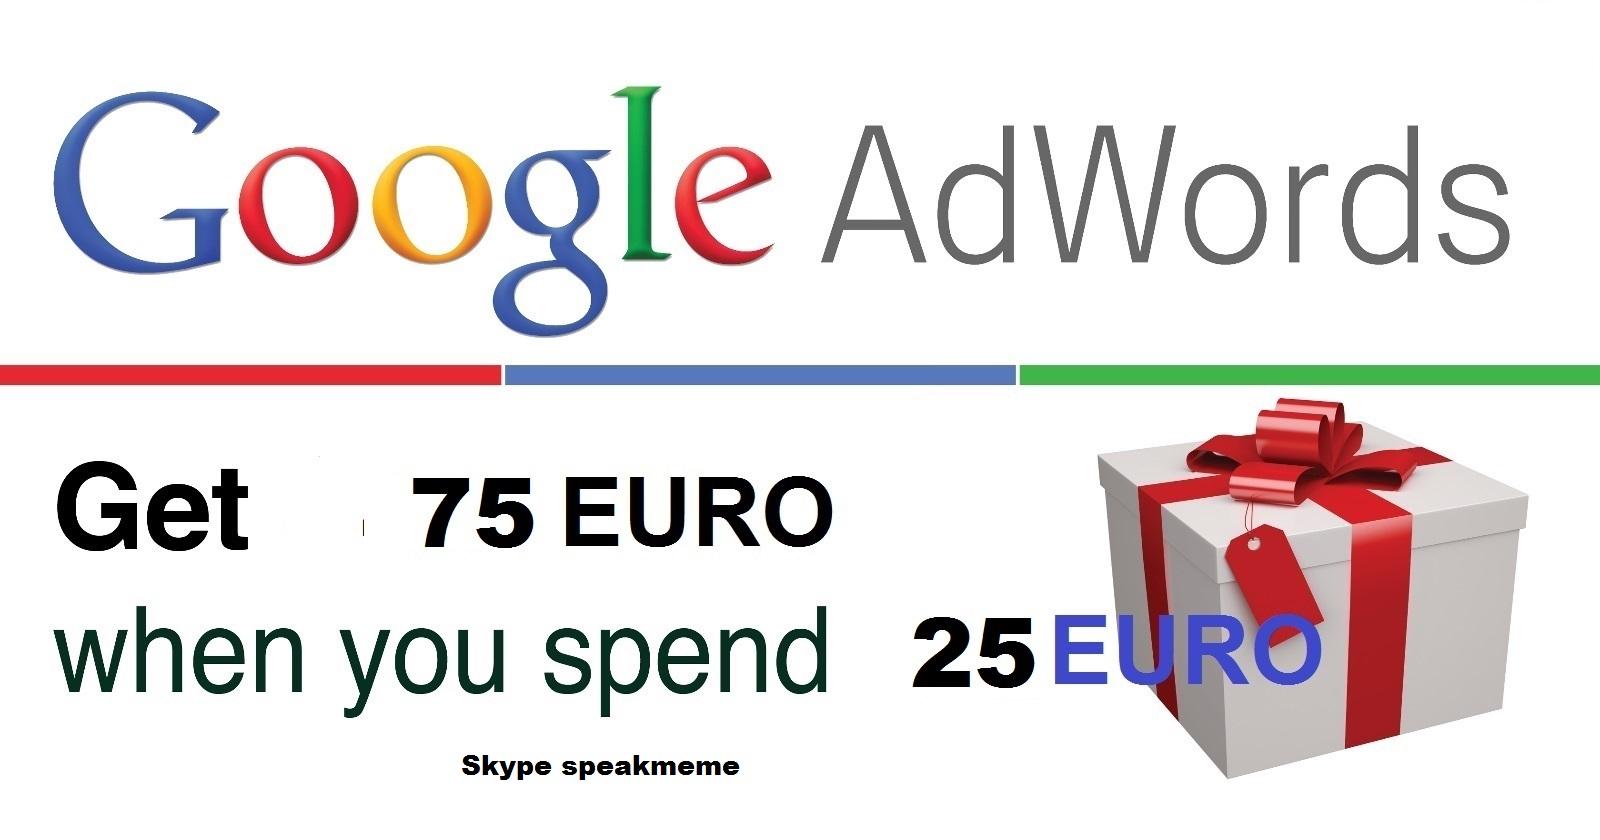 Google Adwords Coupon Ireland